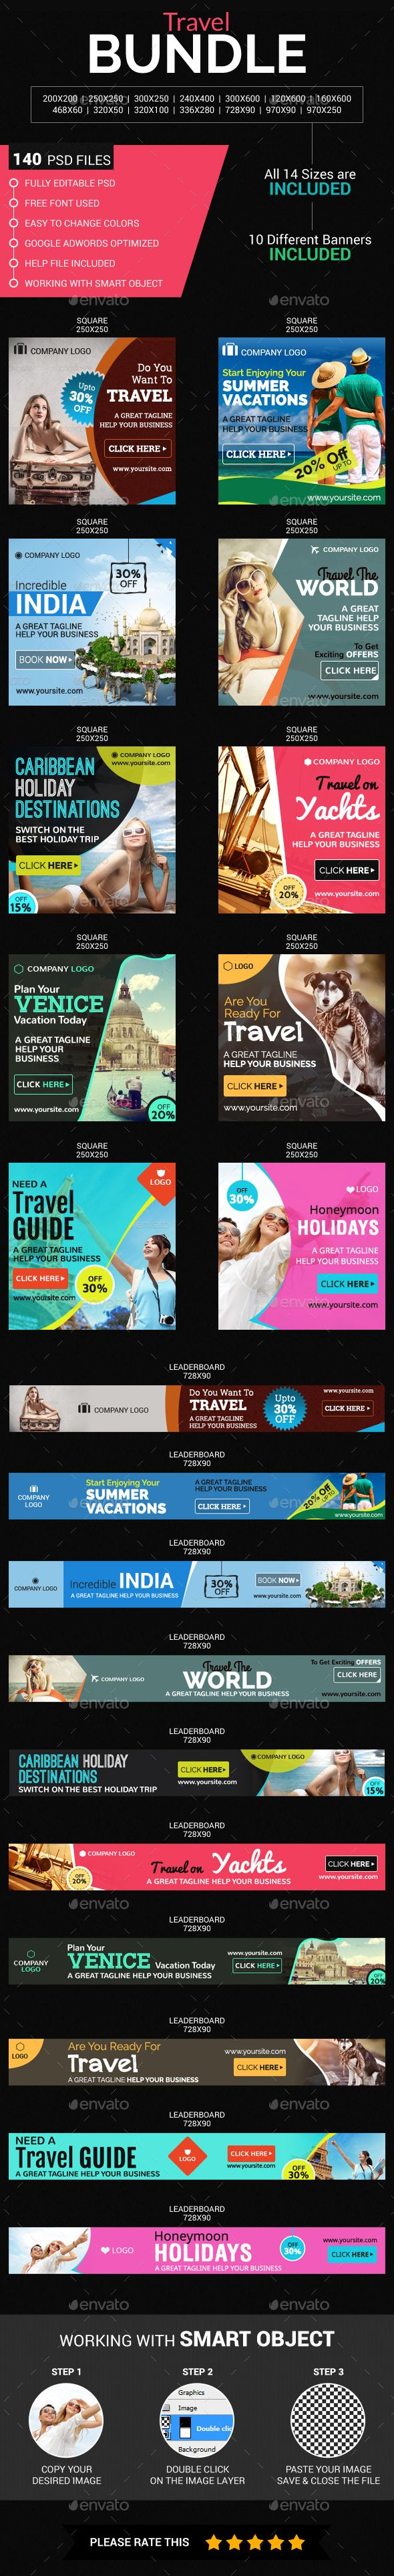 Travel Ads Banner Design Template Bundle (10 Sets) - Banners & Ads Web Element Banner Template PSD. Download here: https://graphicriver.net/item/travel-banner-bundle-10-sets/17725965?s_rank=31&ref=yinkira